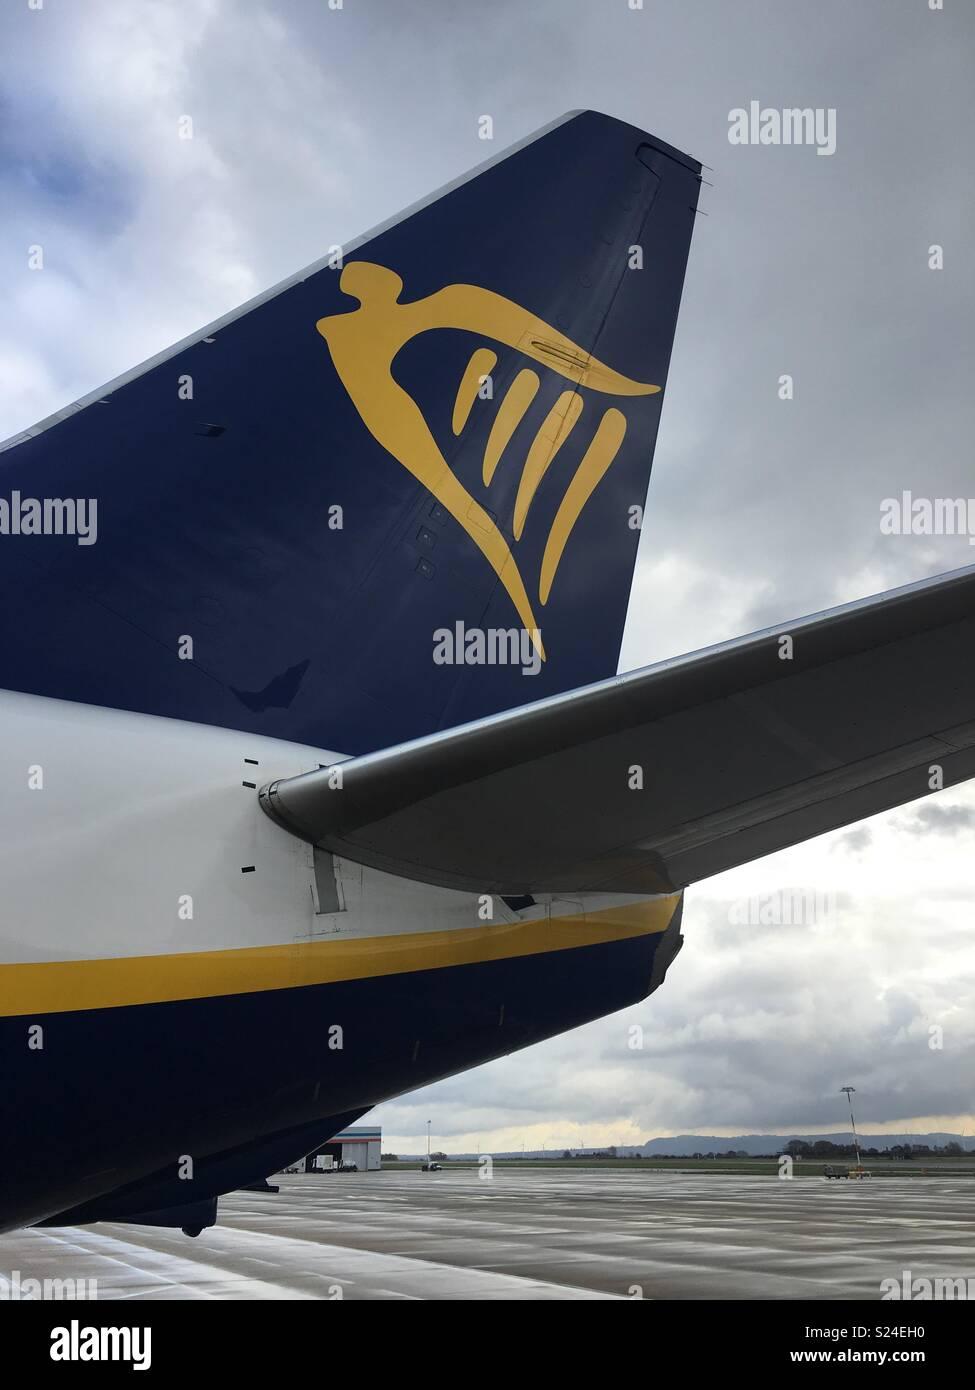 Ryanair logo - Stock Image